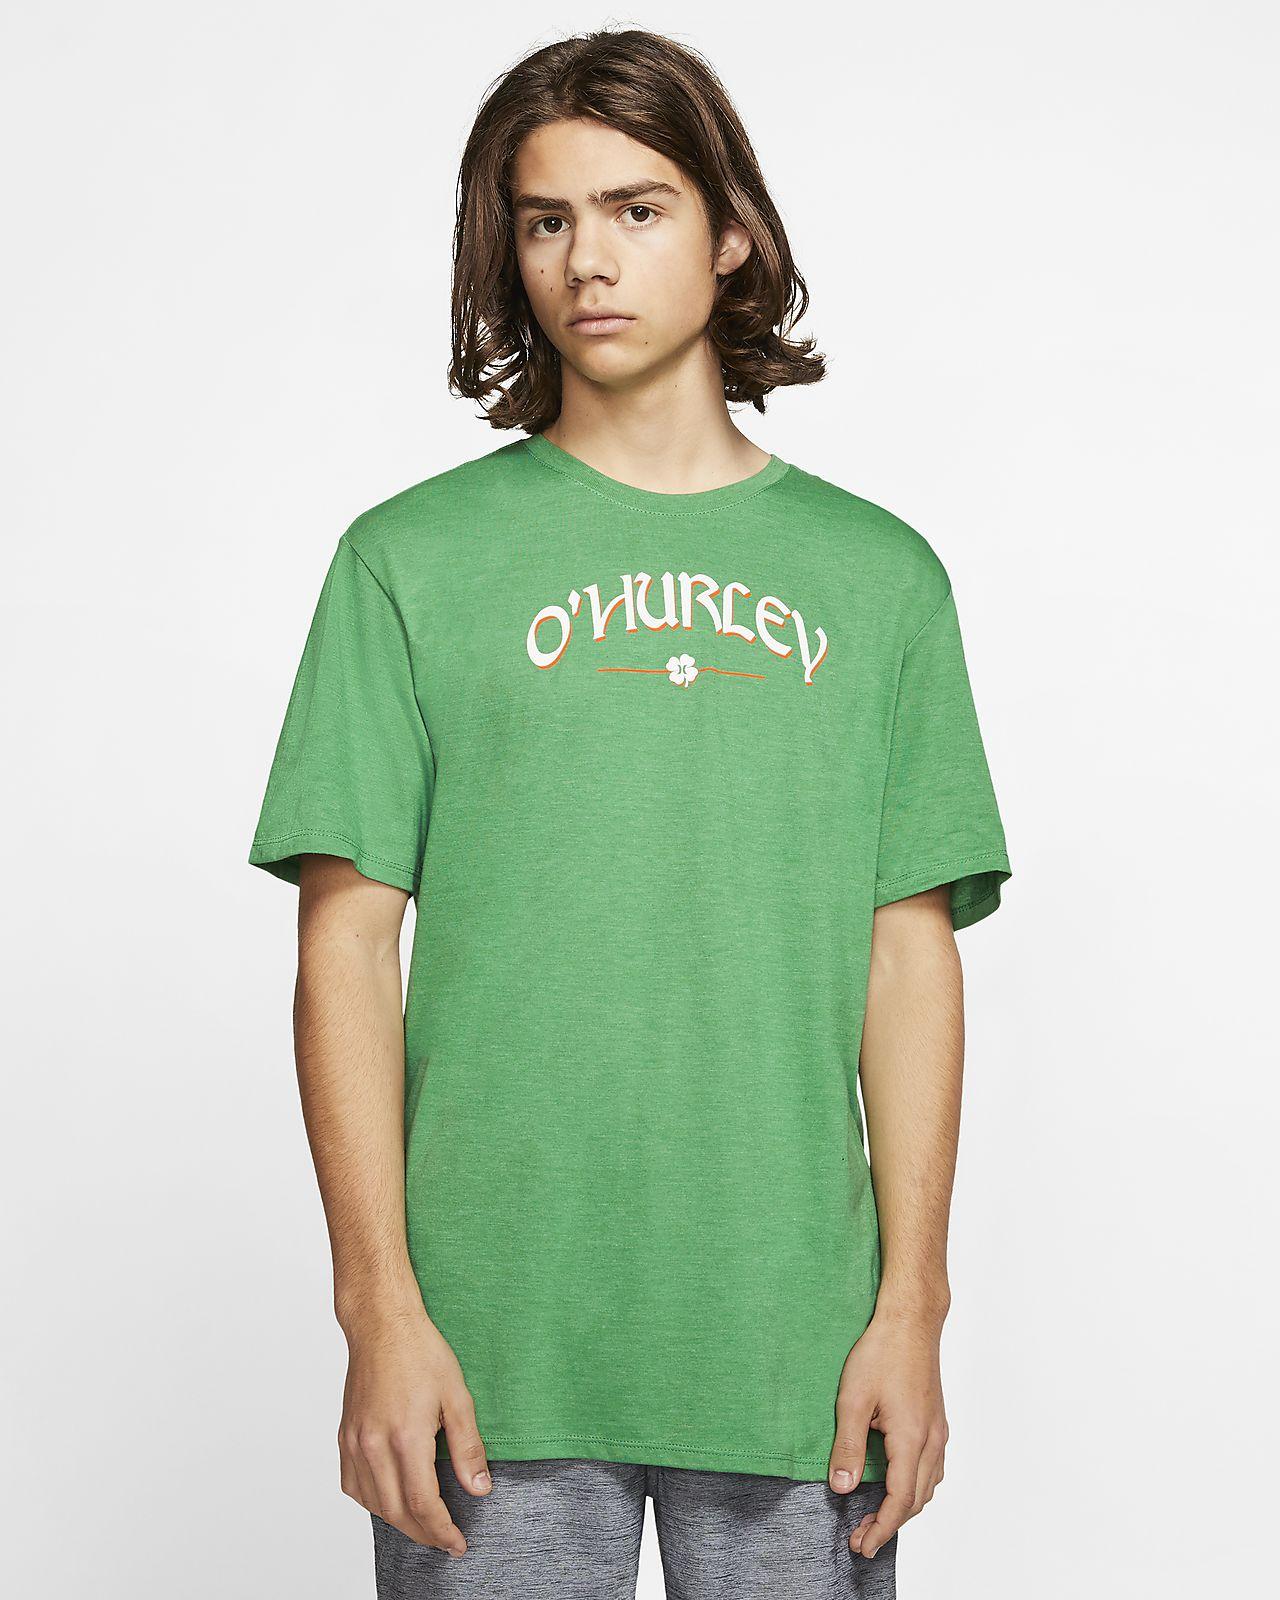 Hurley Premium O'Hurley Herren-T-Shirt